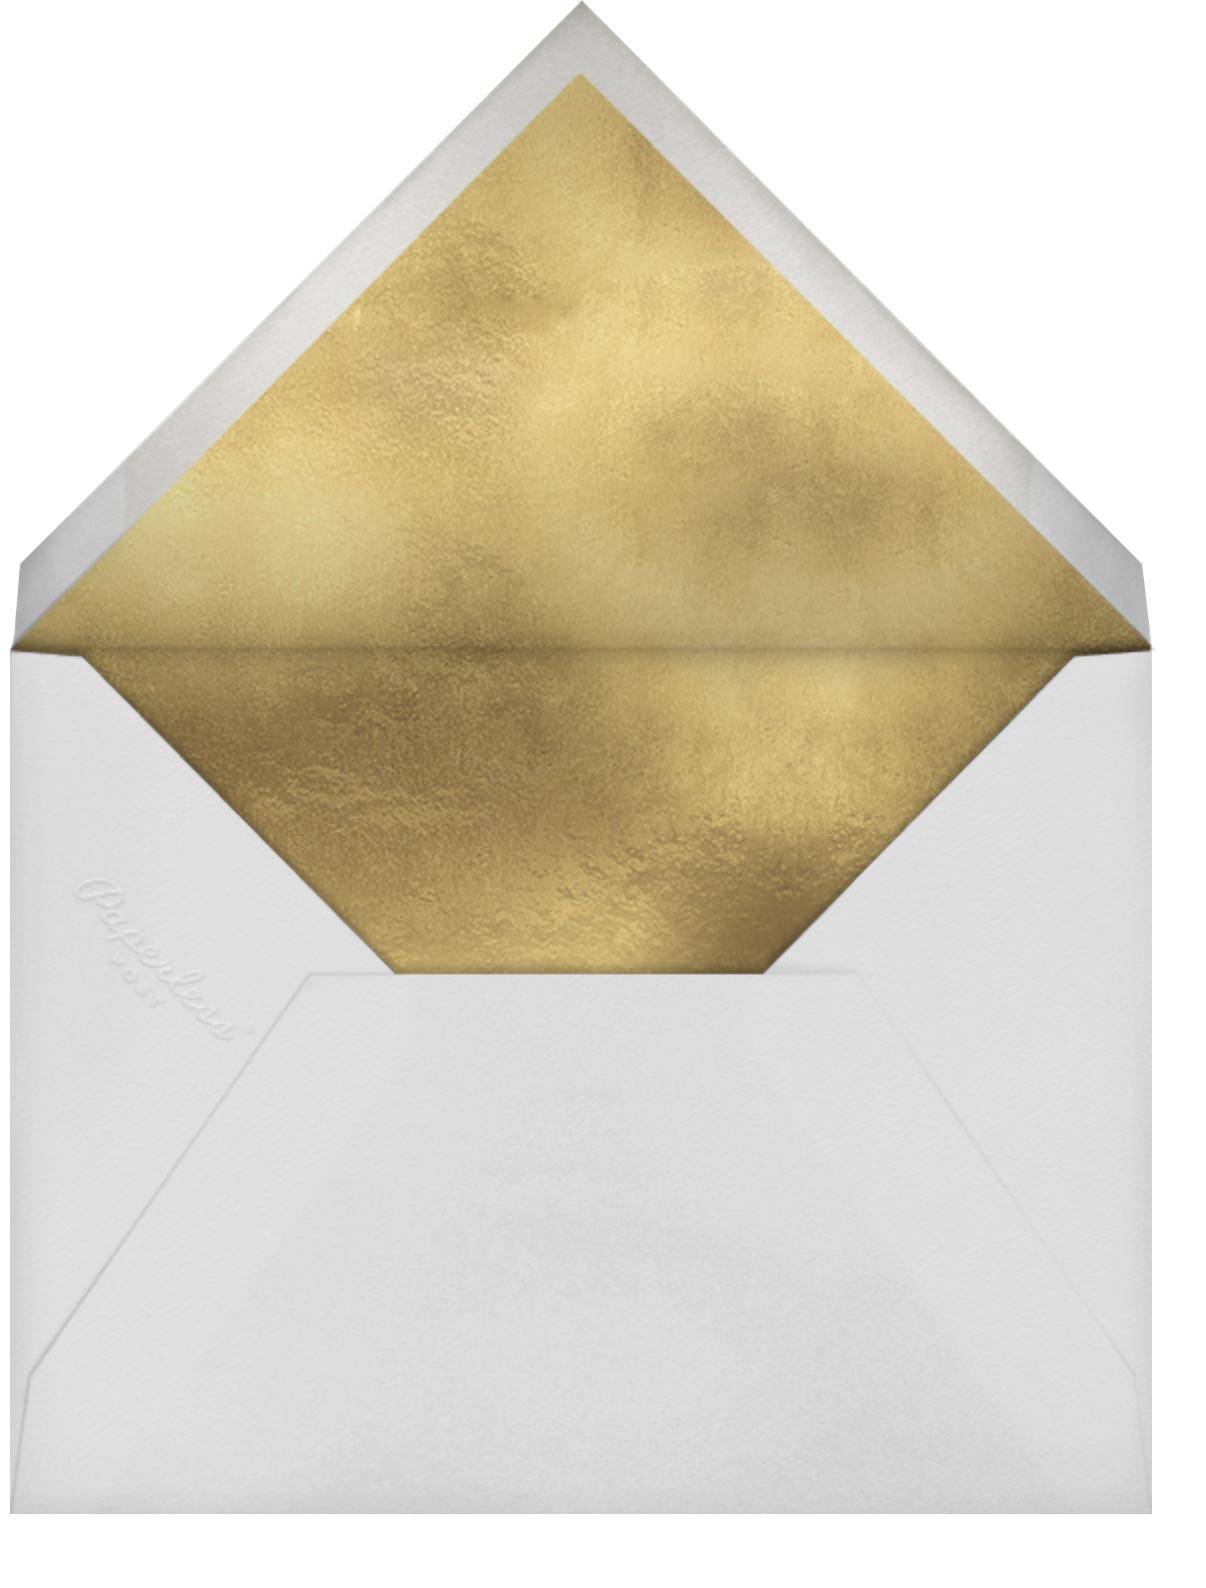 Metallic and Mistletoe - kate spade new york - Kids' birthday - envelope back